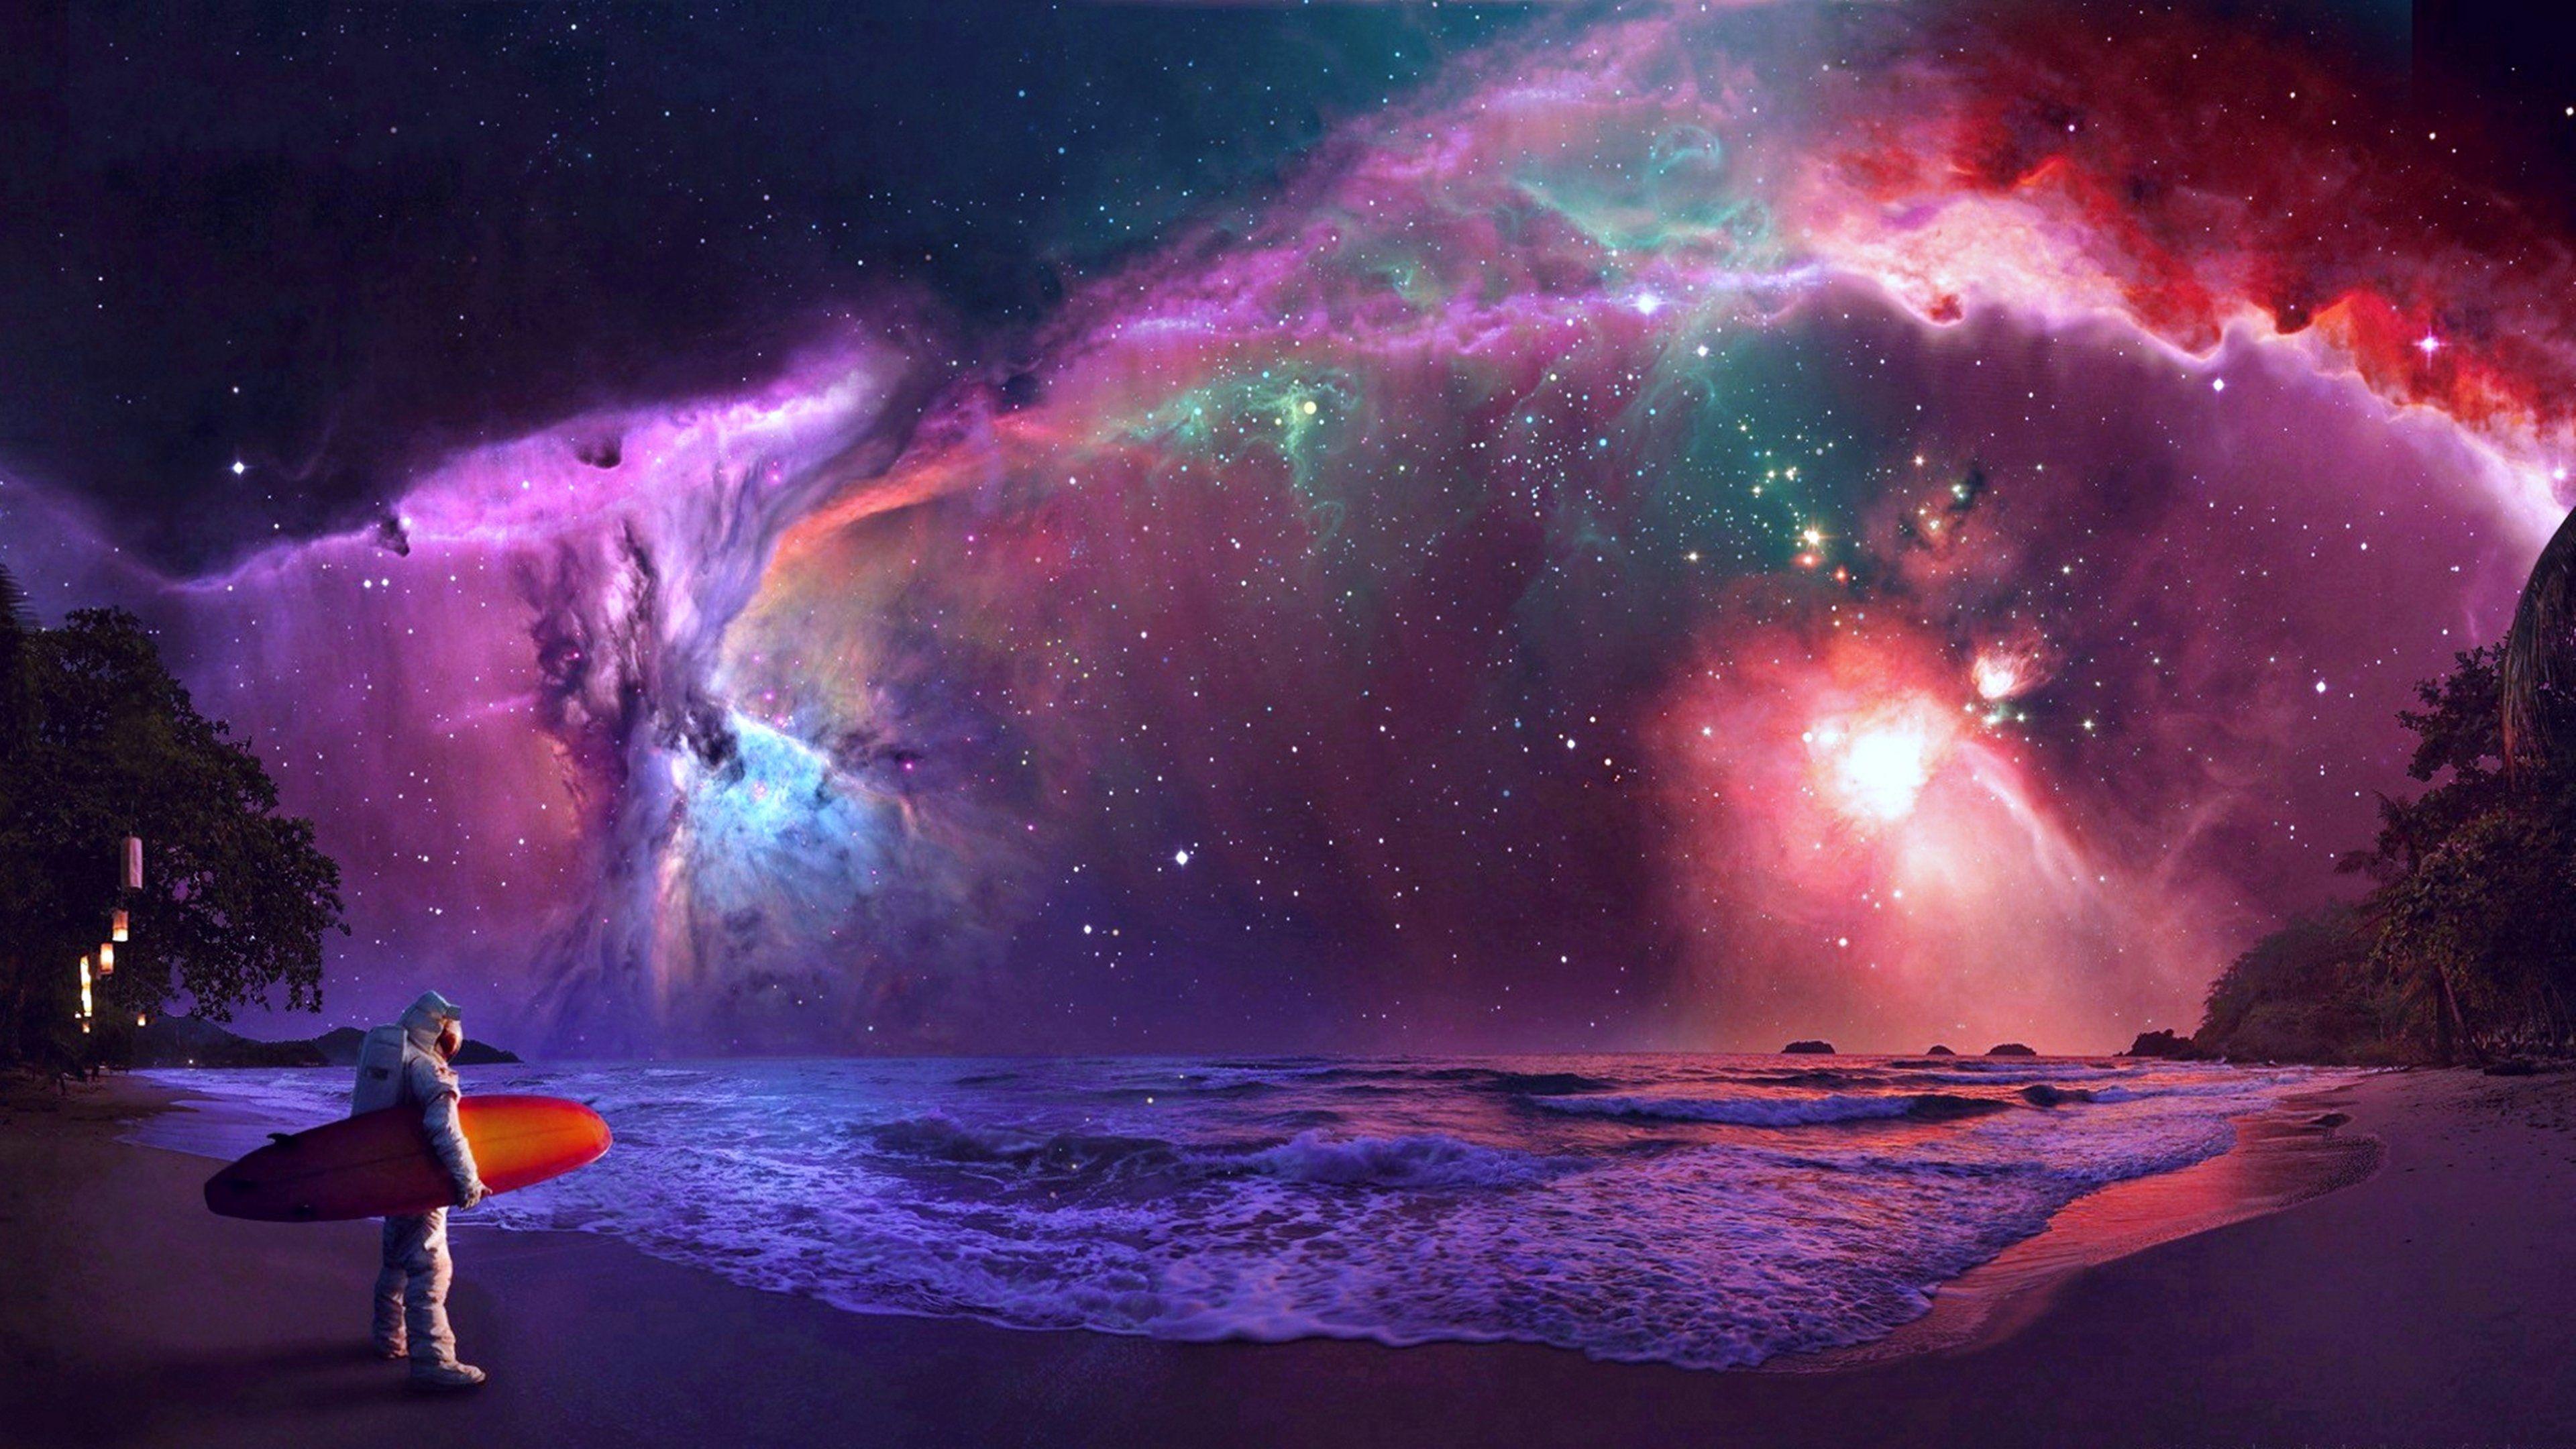 nebula galaxy stars fantasy magical space suns planets wallpaper